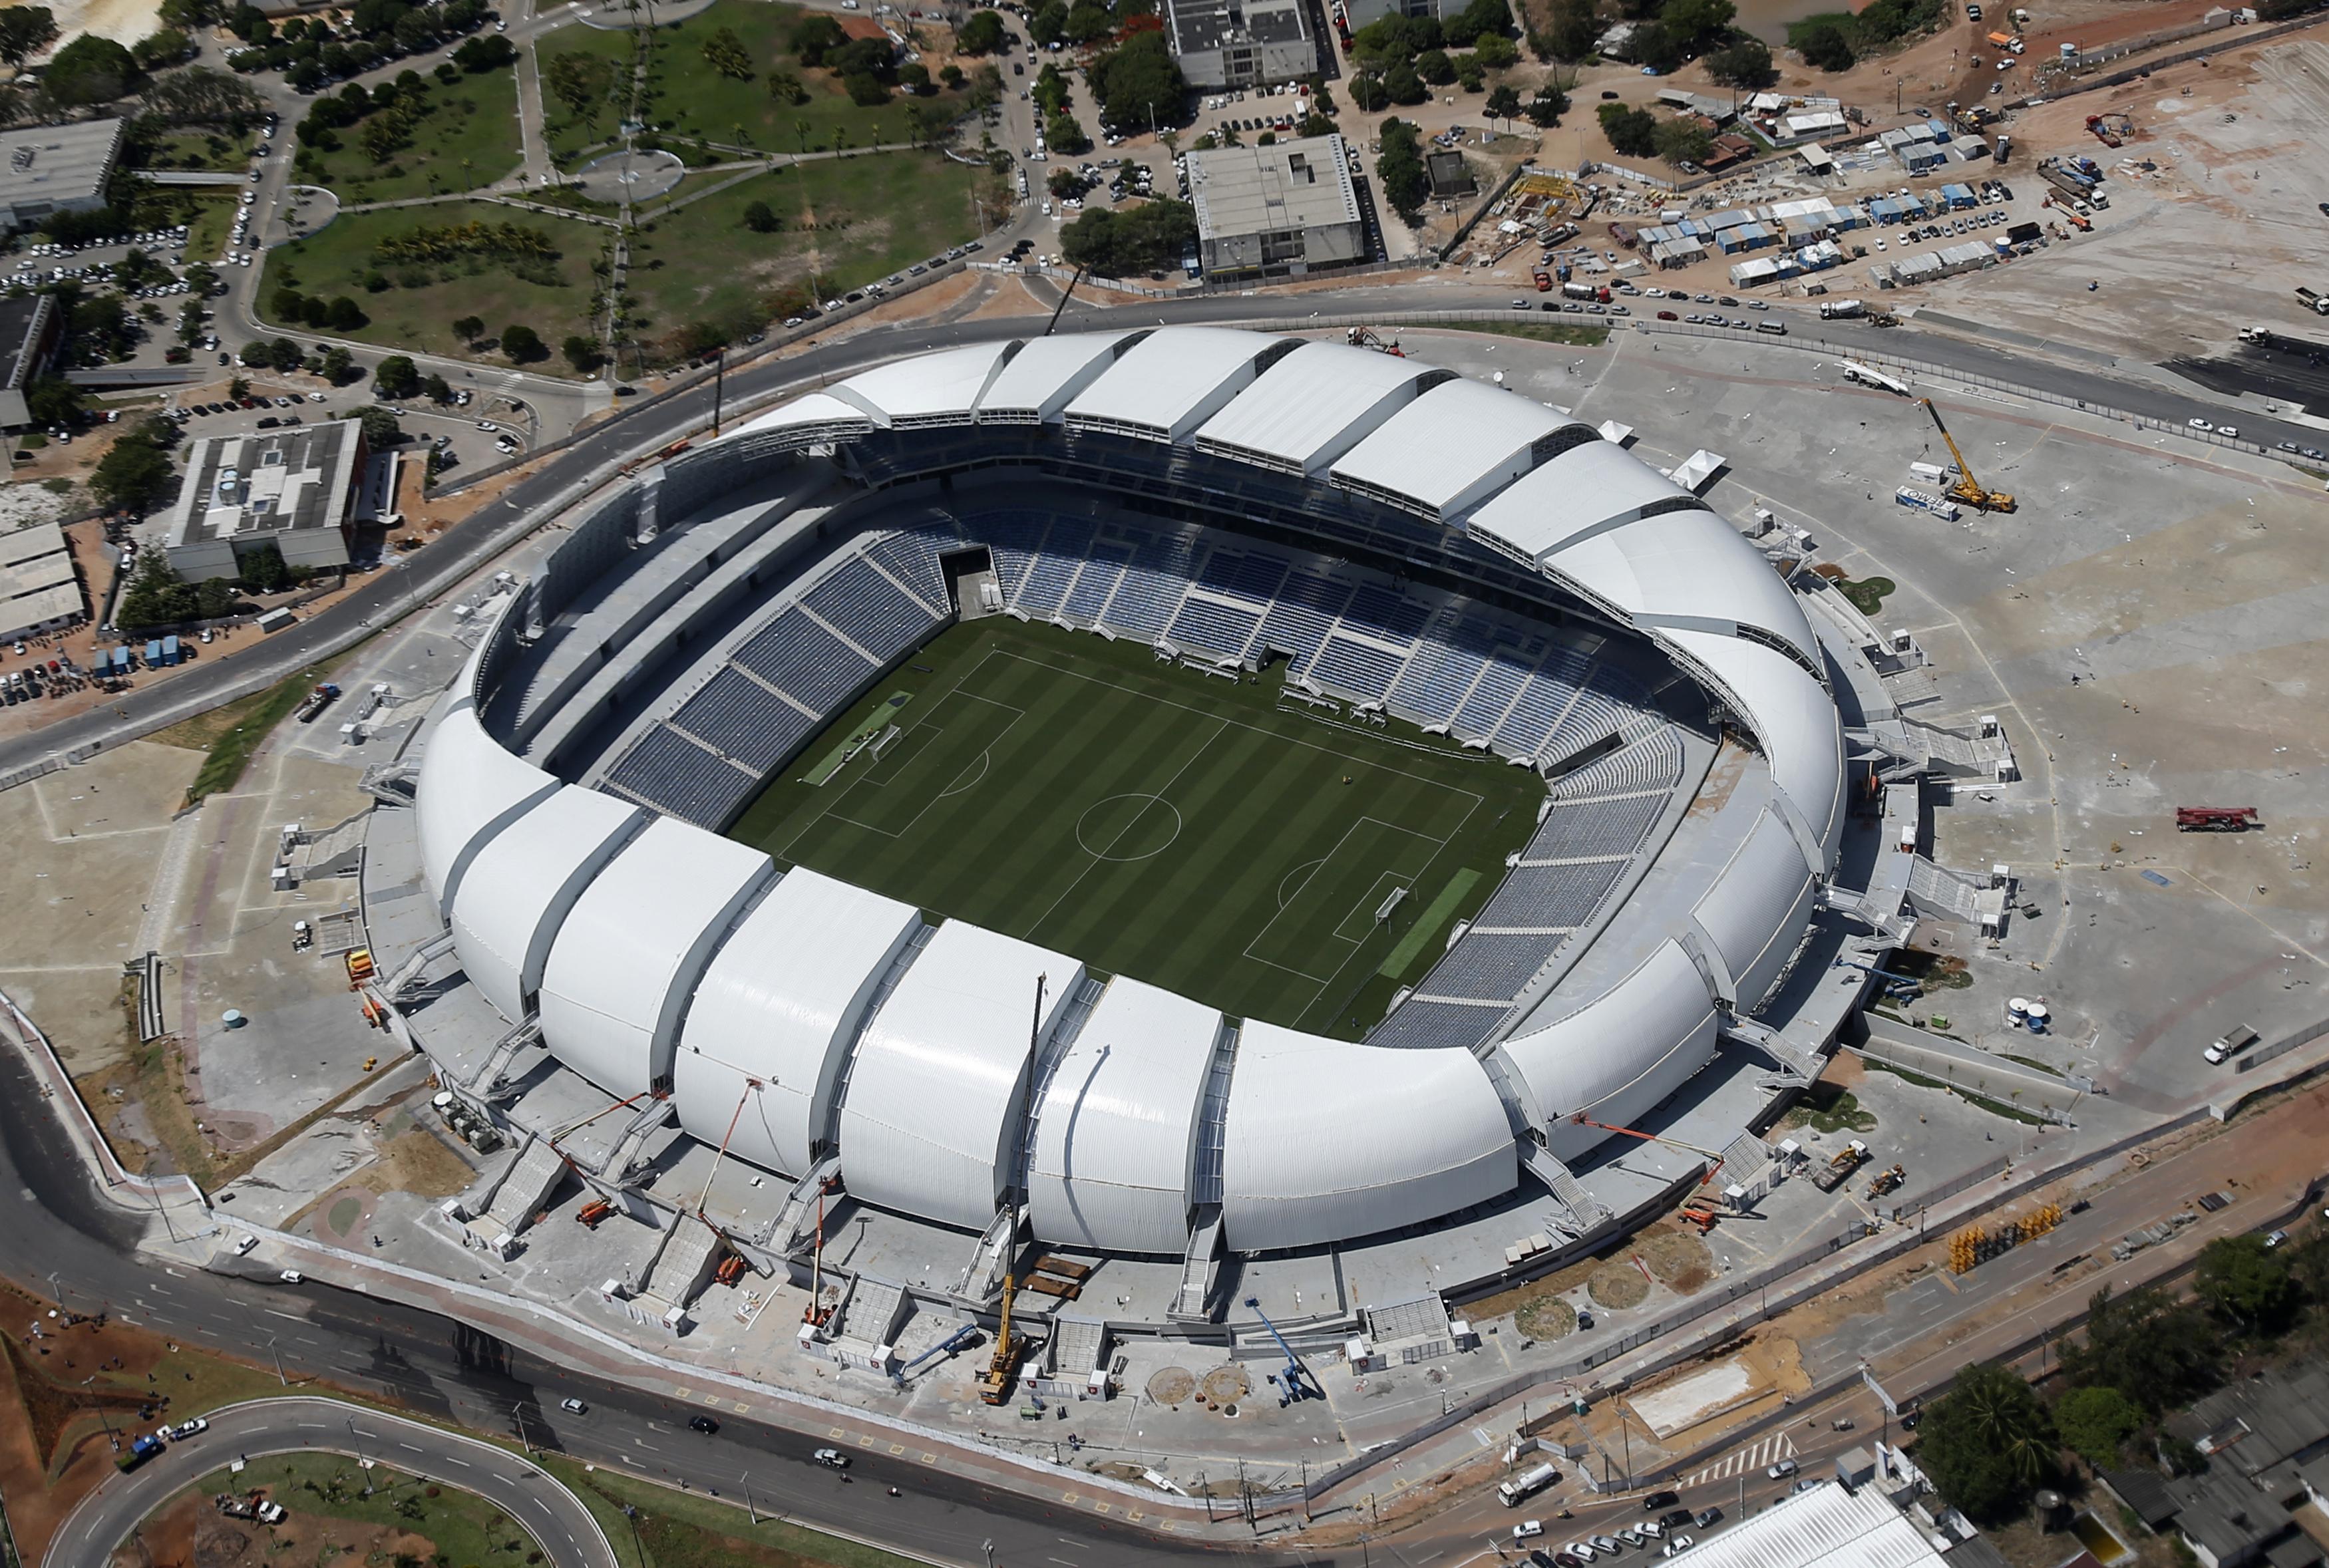 Arenas das Dunas                                                               City: Natal                                                              Constructed: 1972                                                              Capacity: 39,000